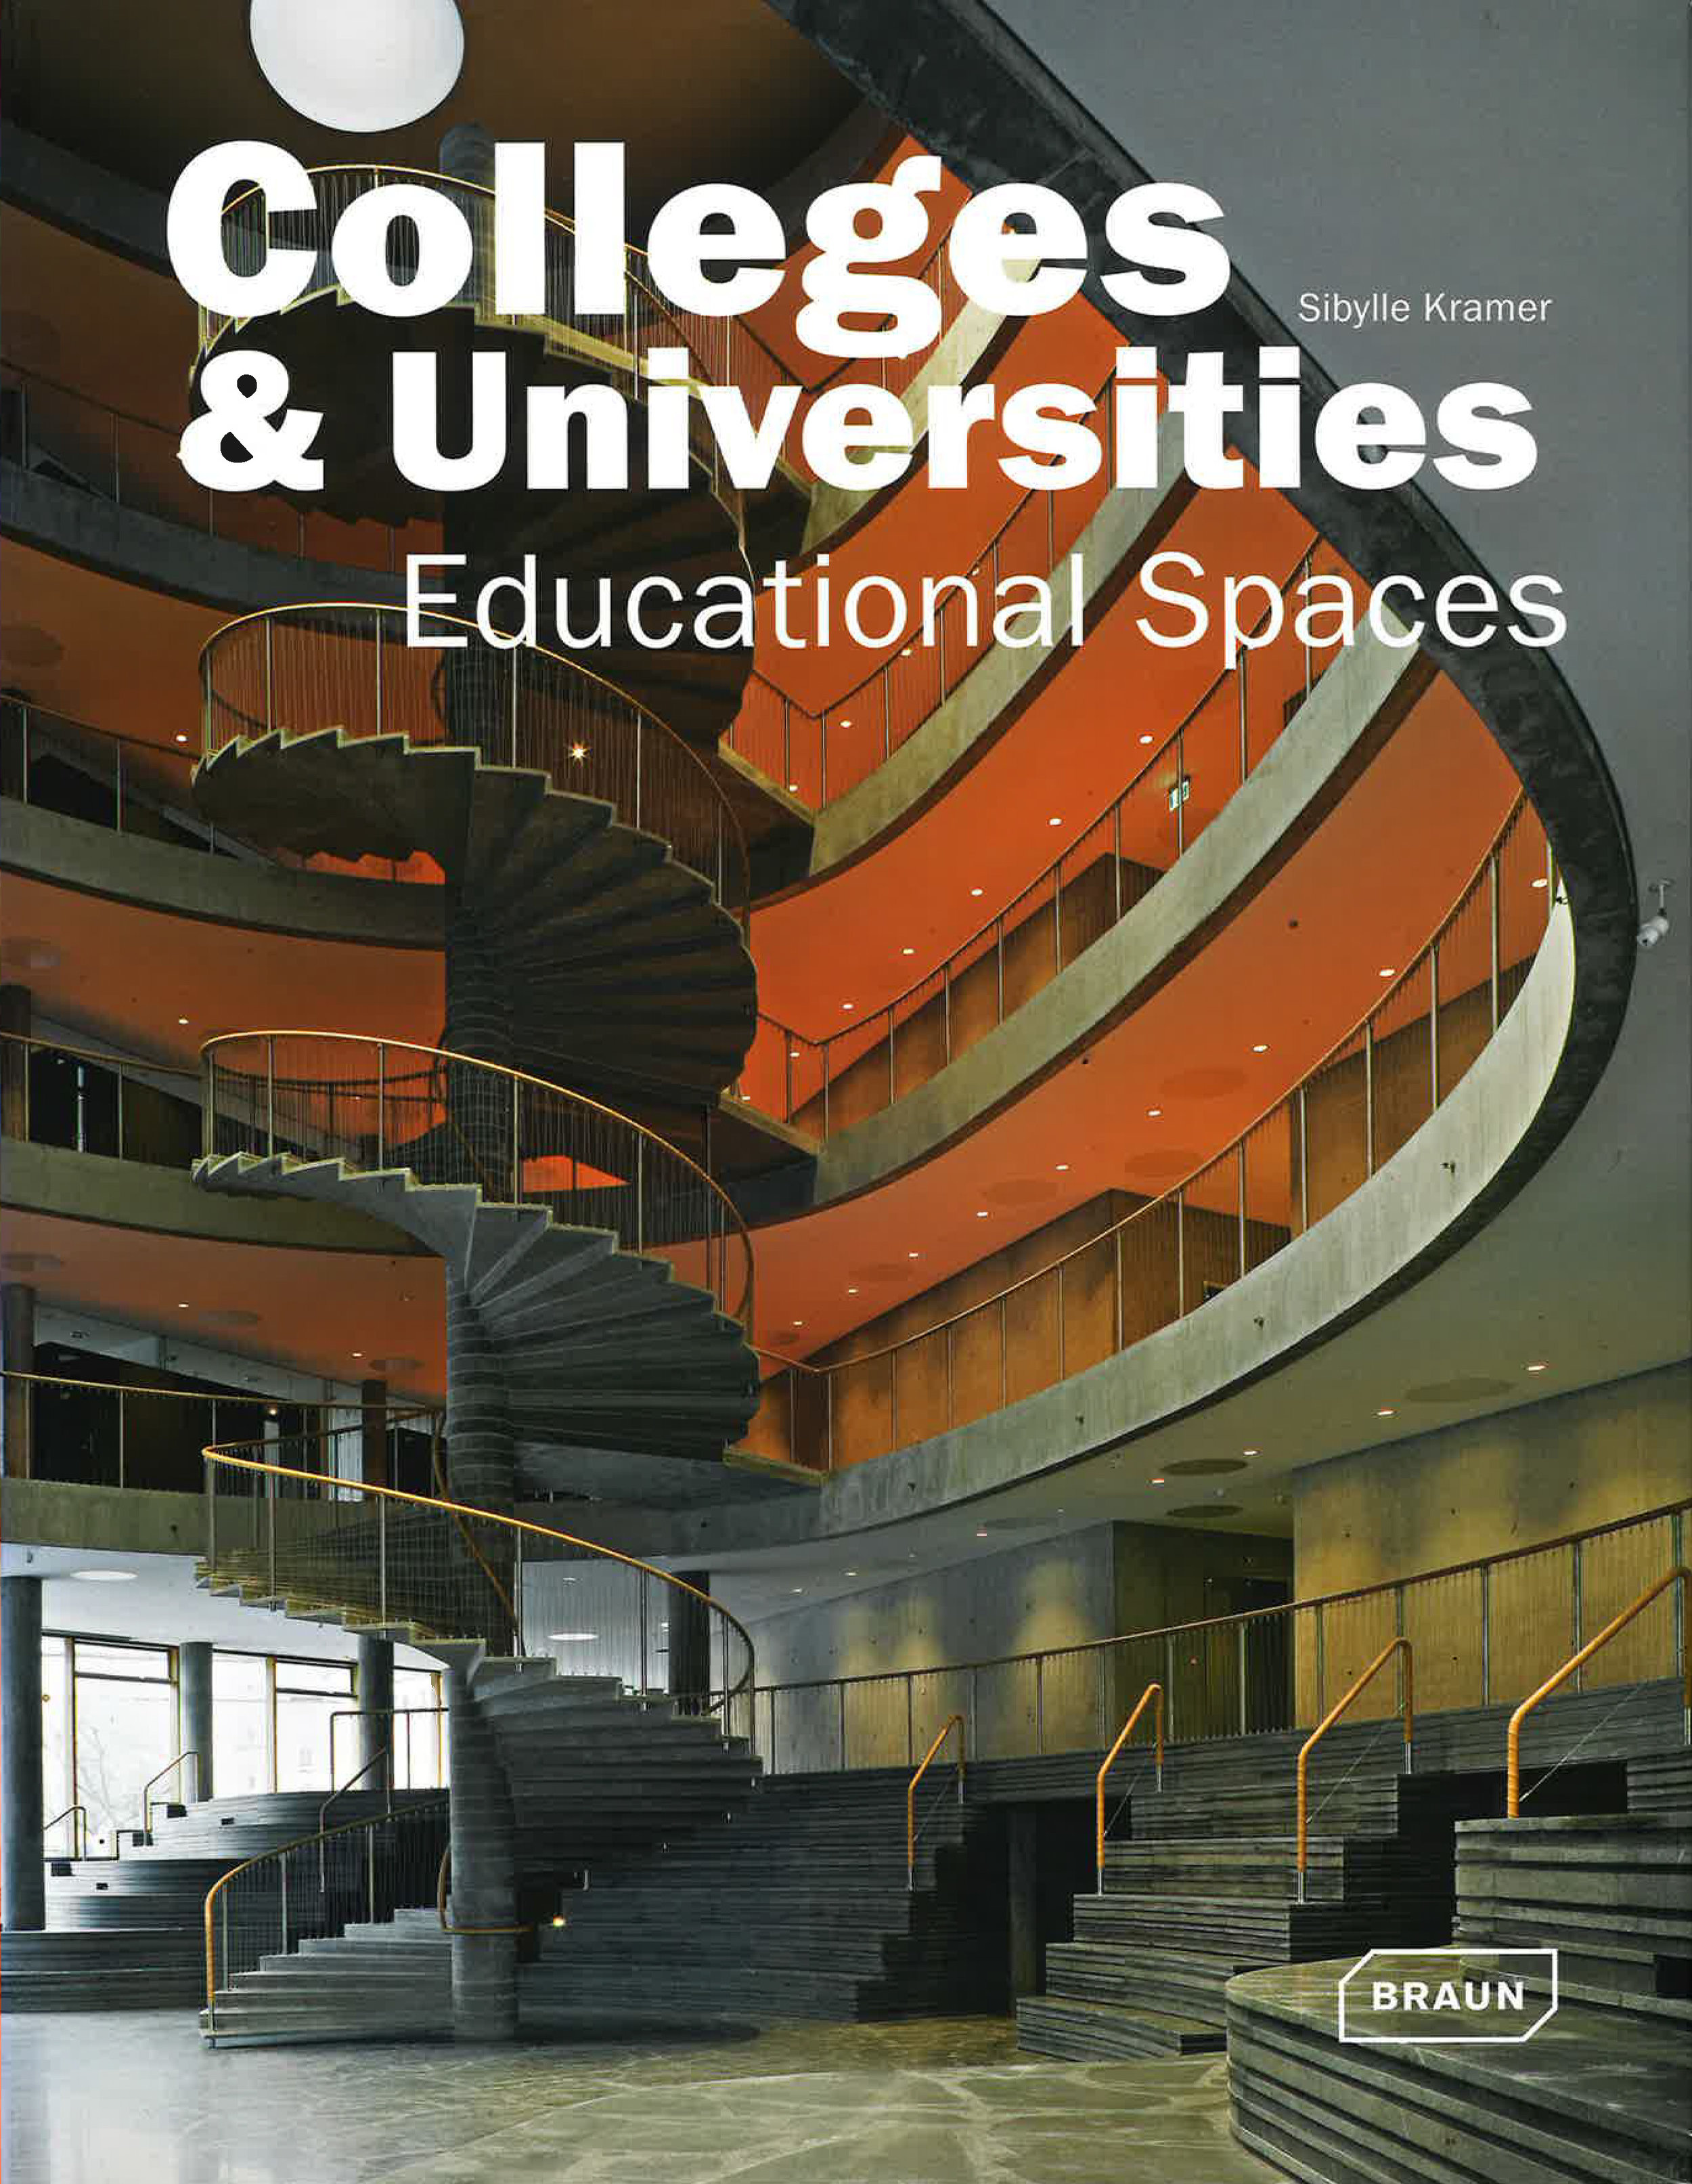 Colleges & Universities Educational Space Sibylle Kramer Braun Publishing, Salenstein CH 2010 ISBN 978-3-03768-036-0